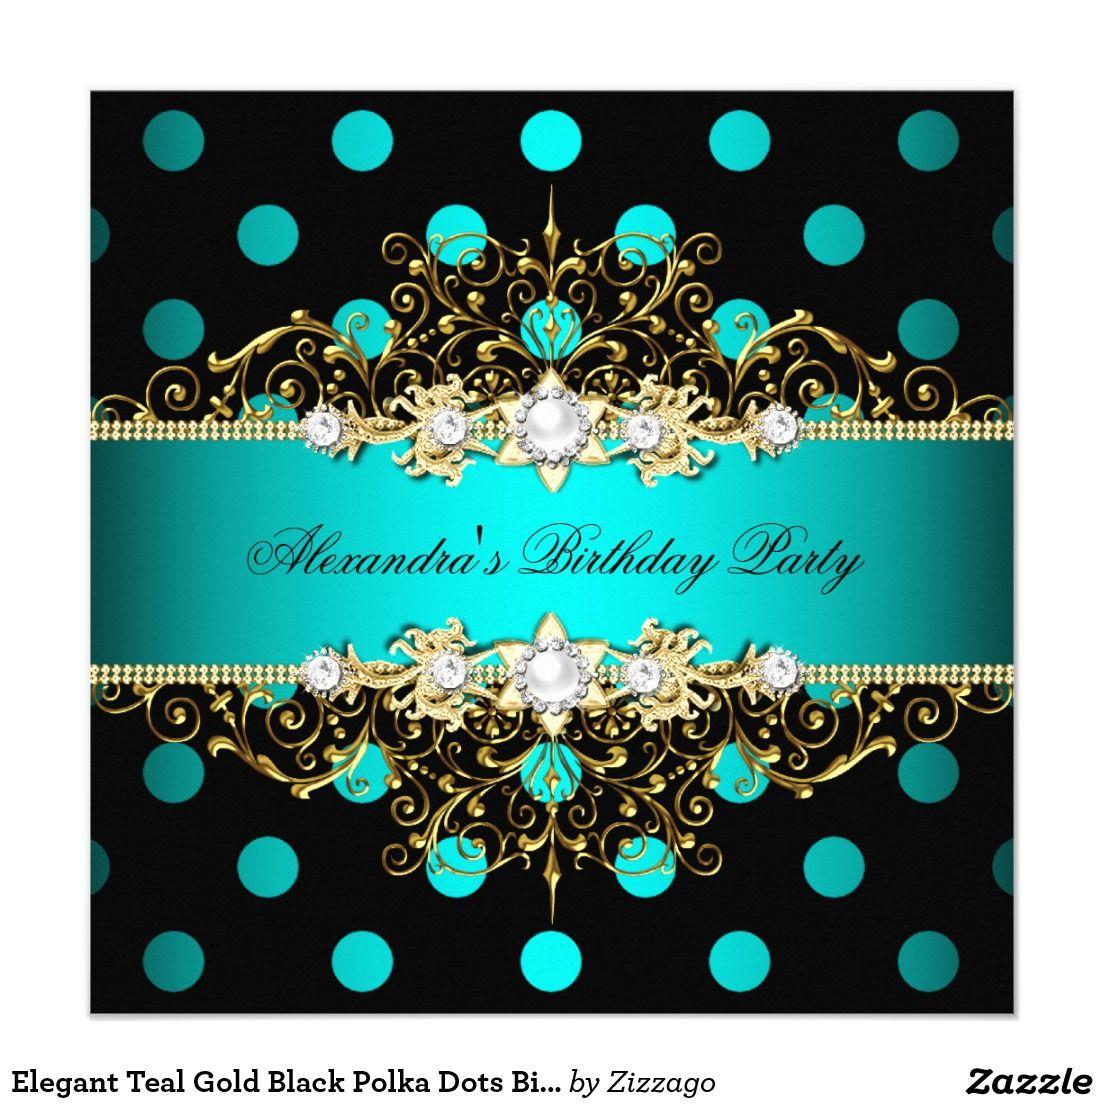 Elegant Teal Gold Black Polka Dots Birthday Party Card | Polka dot ...